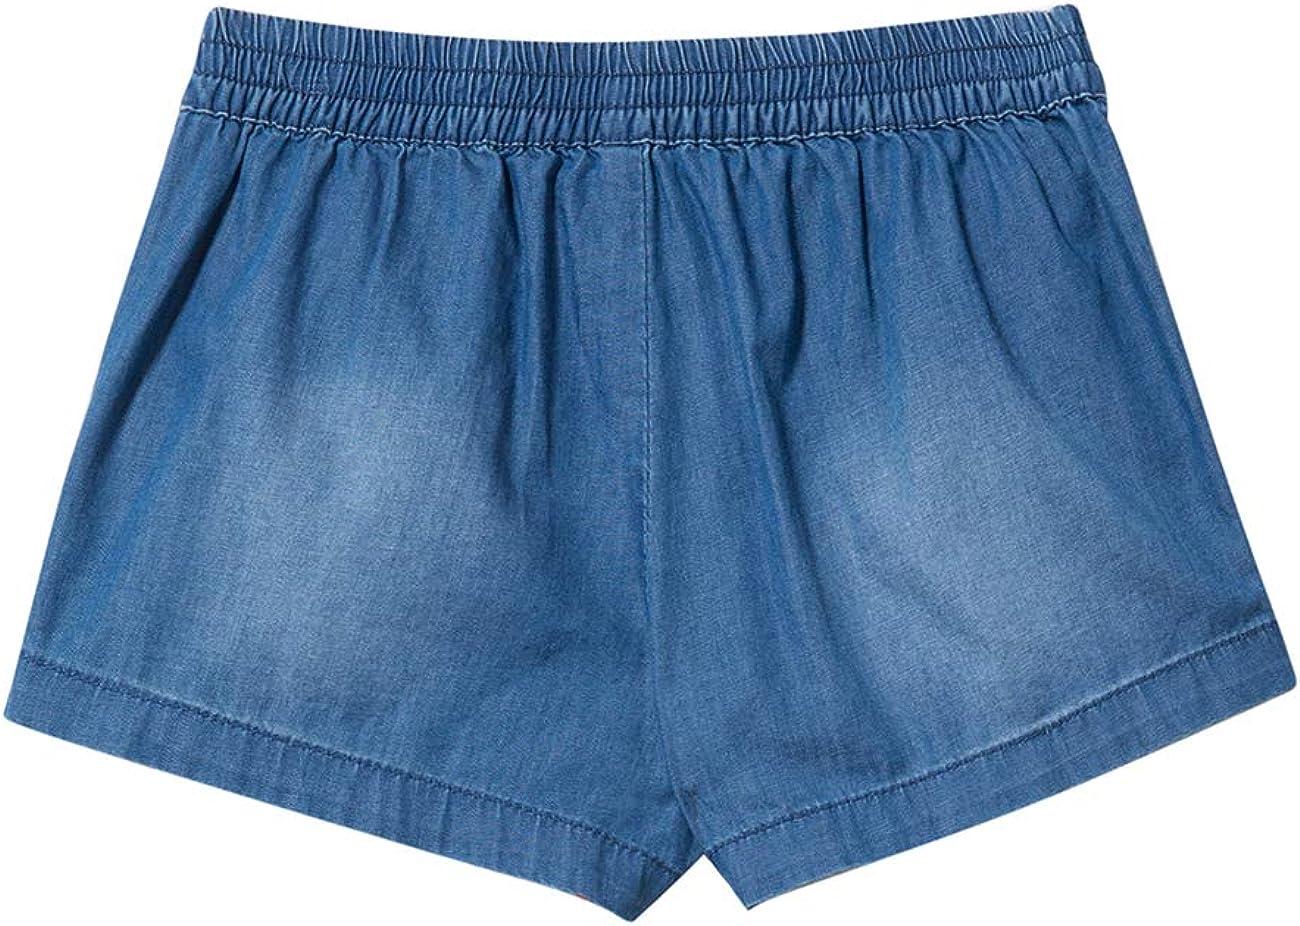 Denim/_buendia Pantaloncini Bambina Desigual Girl Short Trousers